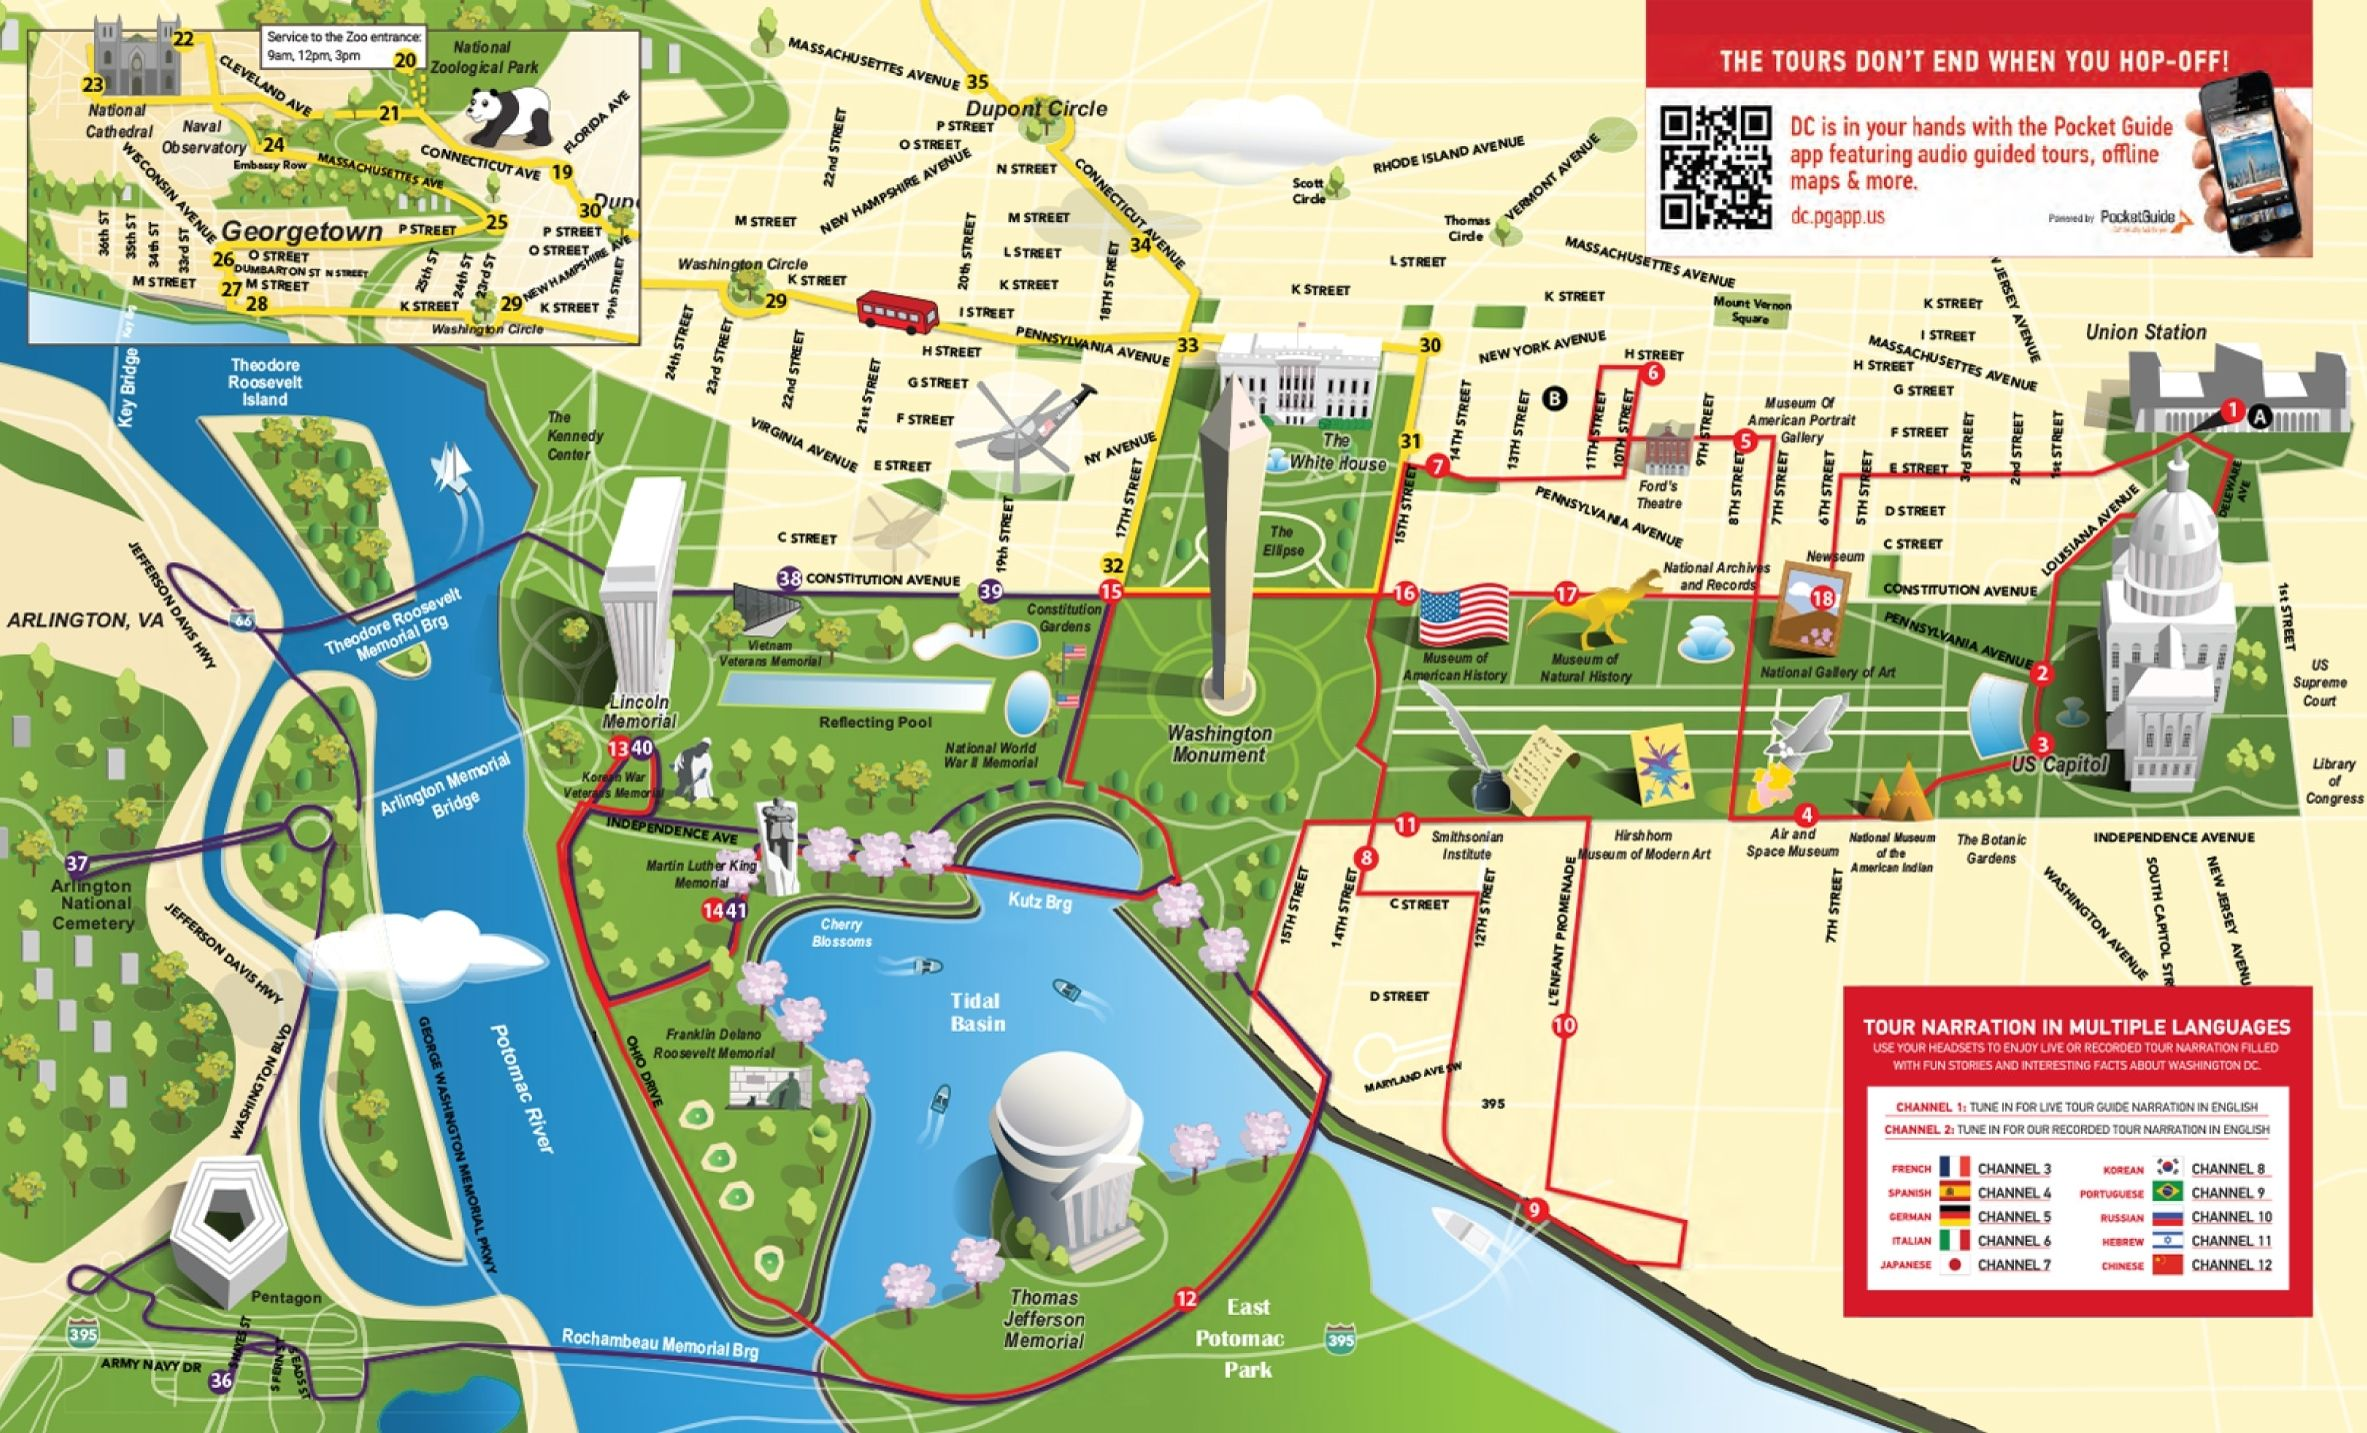 Map Of Tourist Attractions In Washington Dc Washington Dc